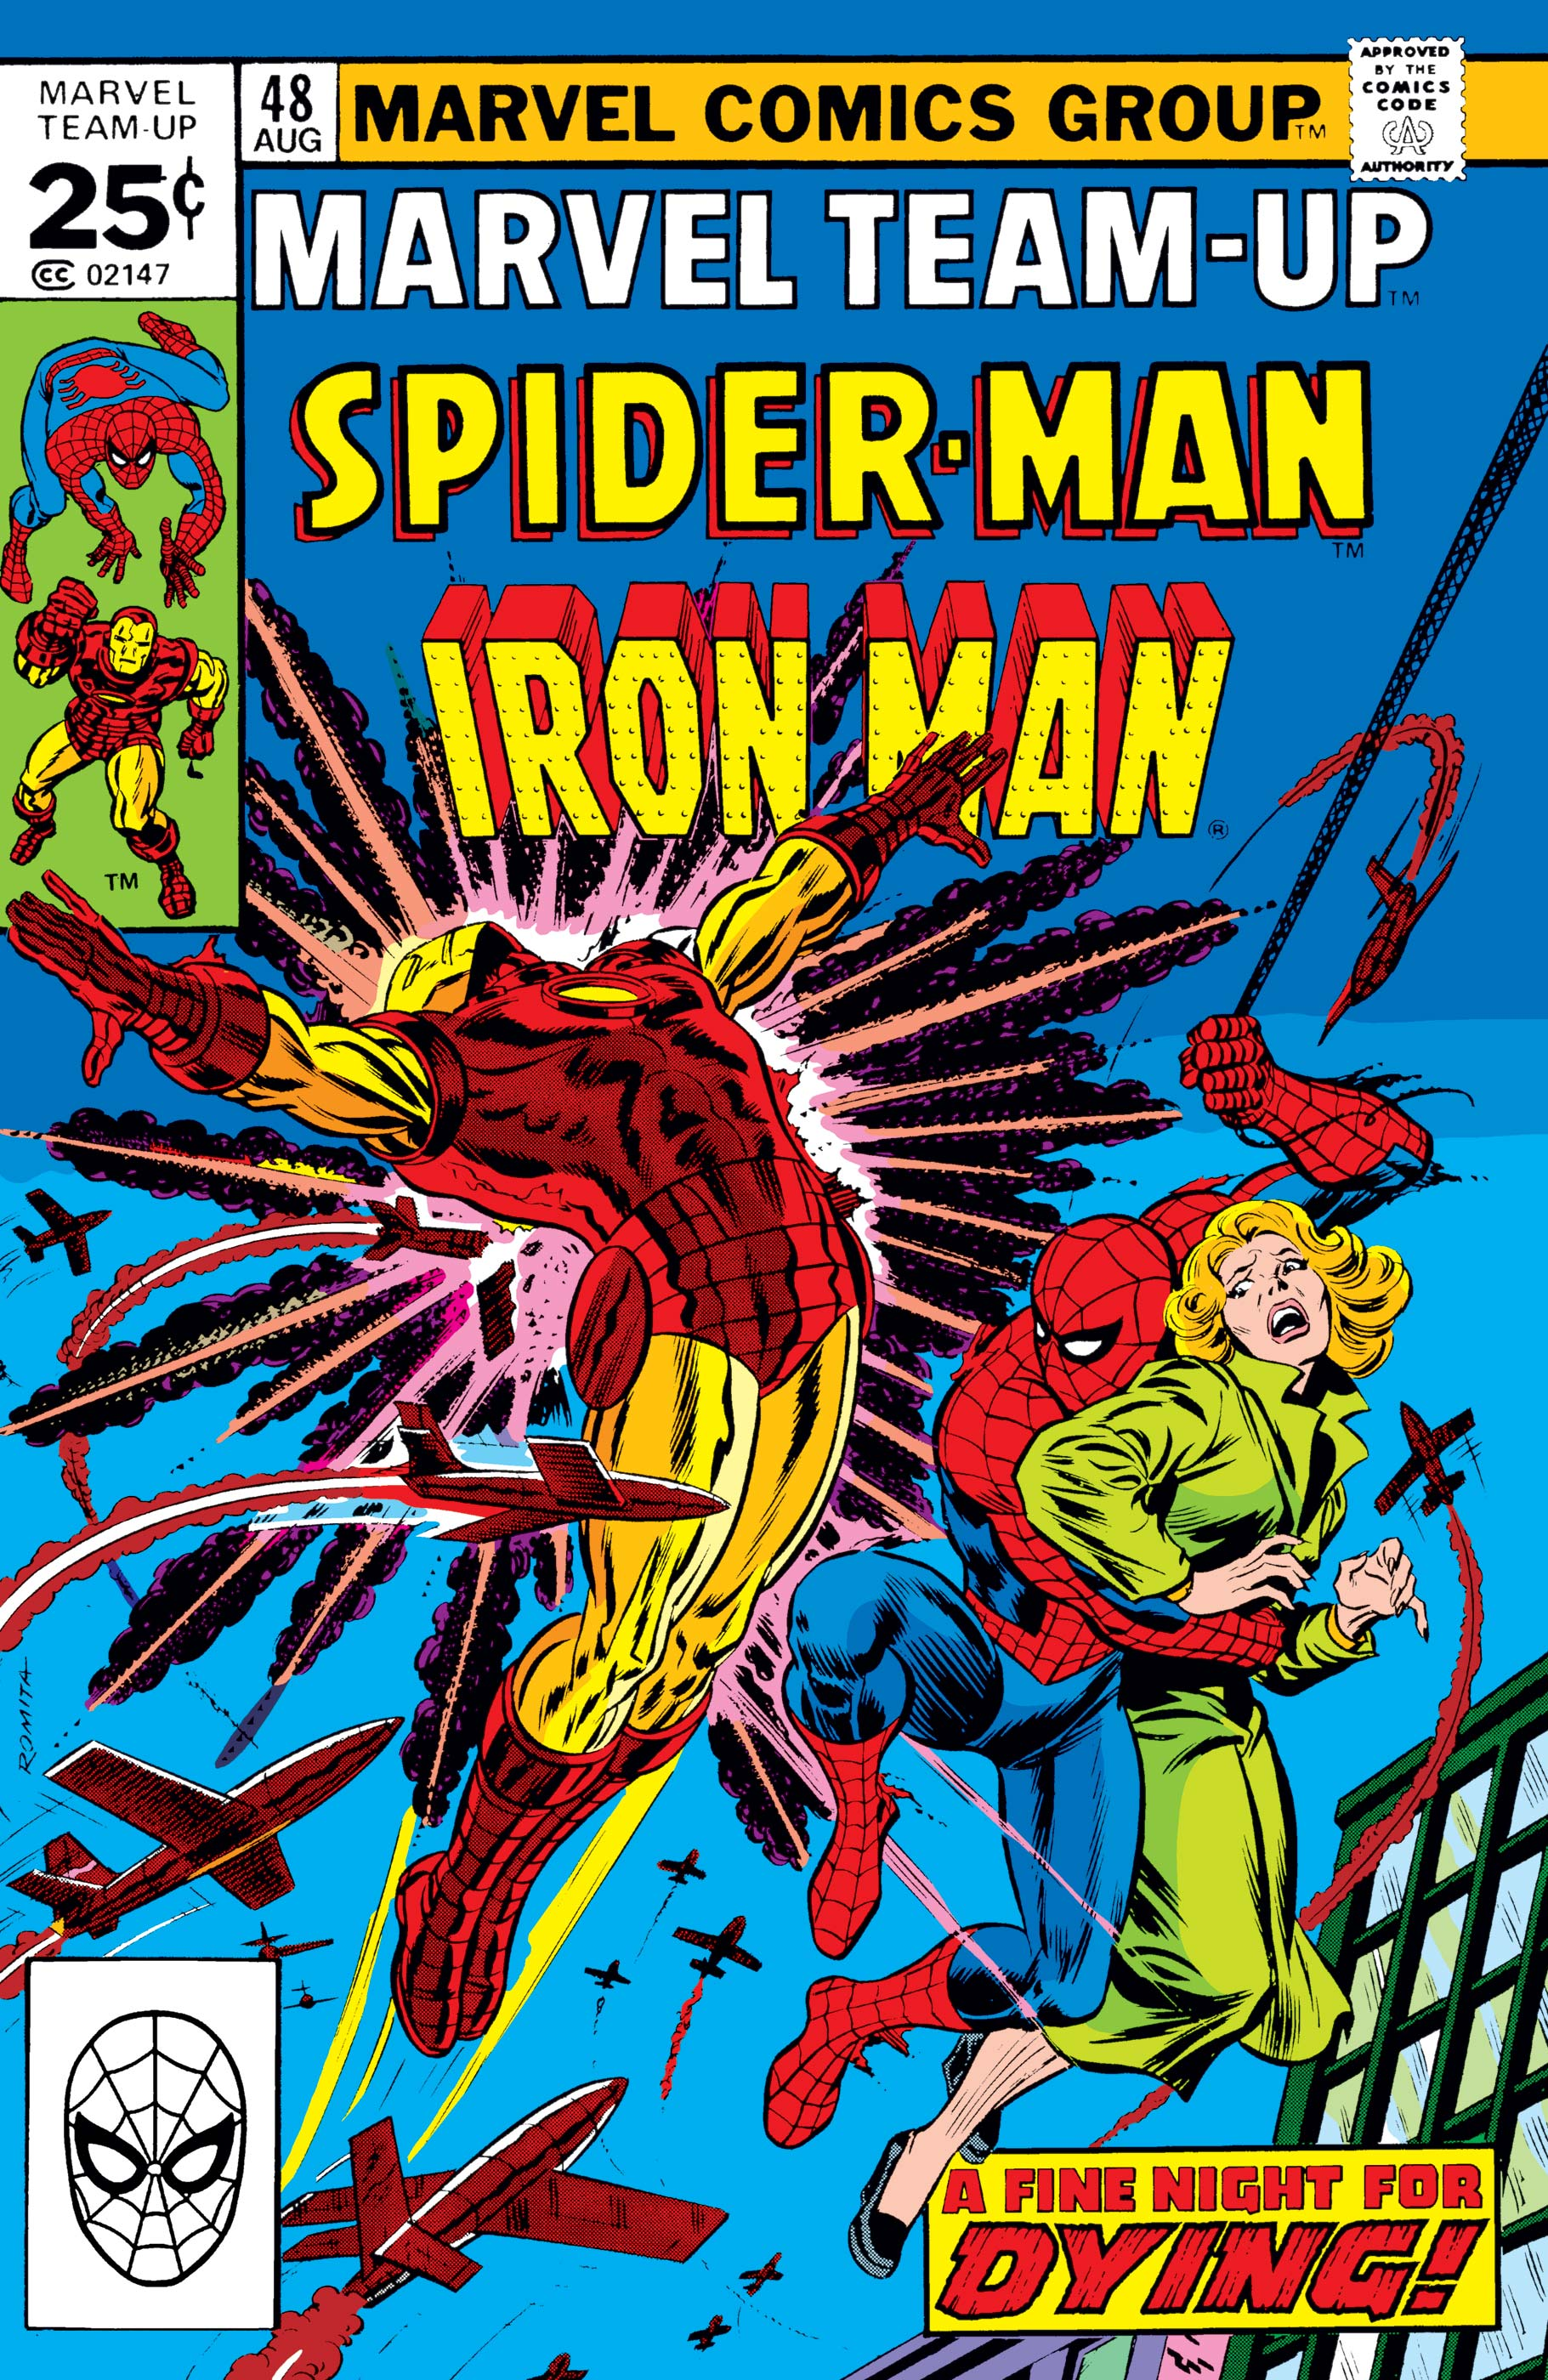 Marvel Team-Up (1972) #48